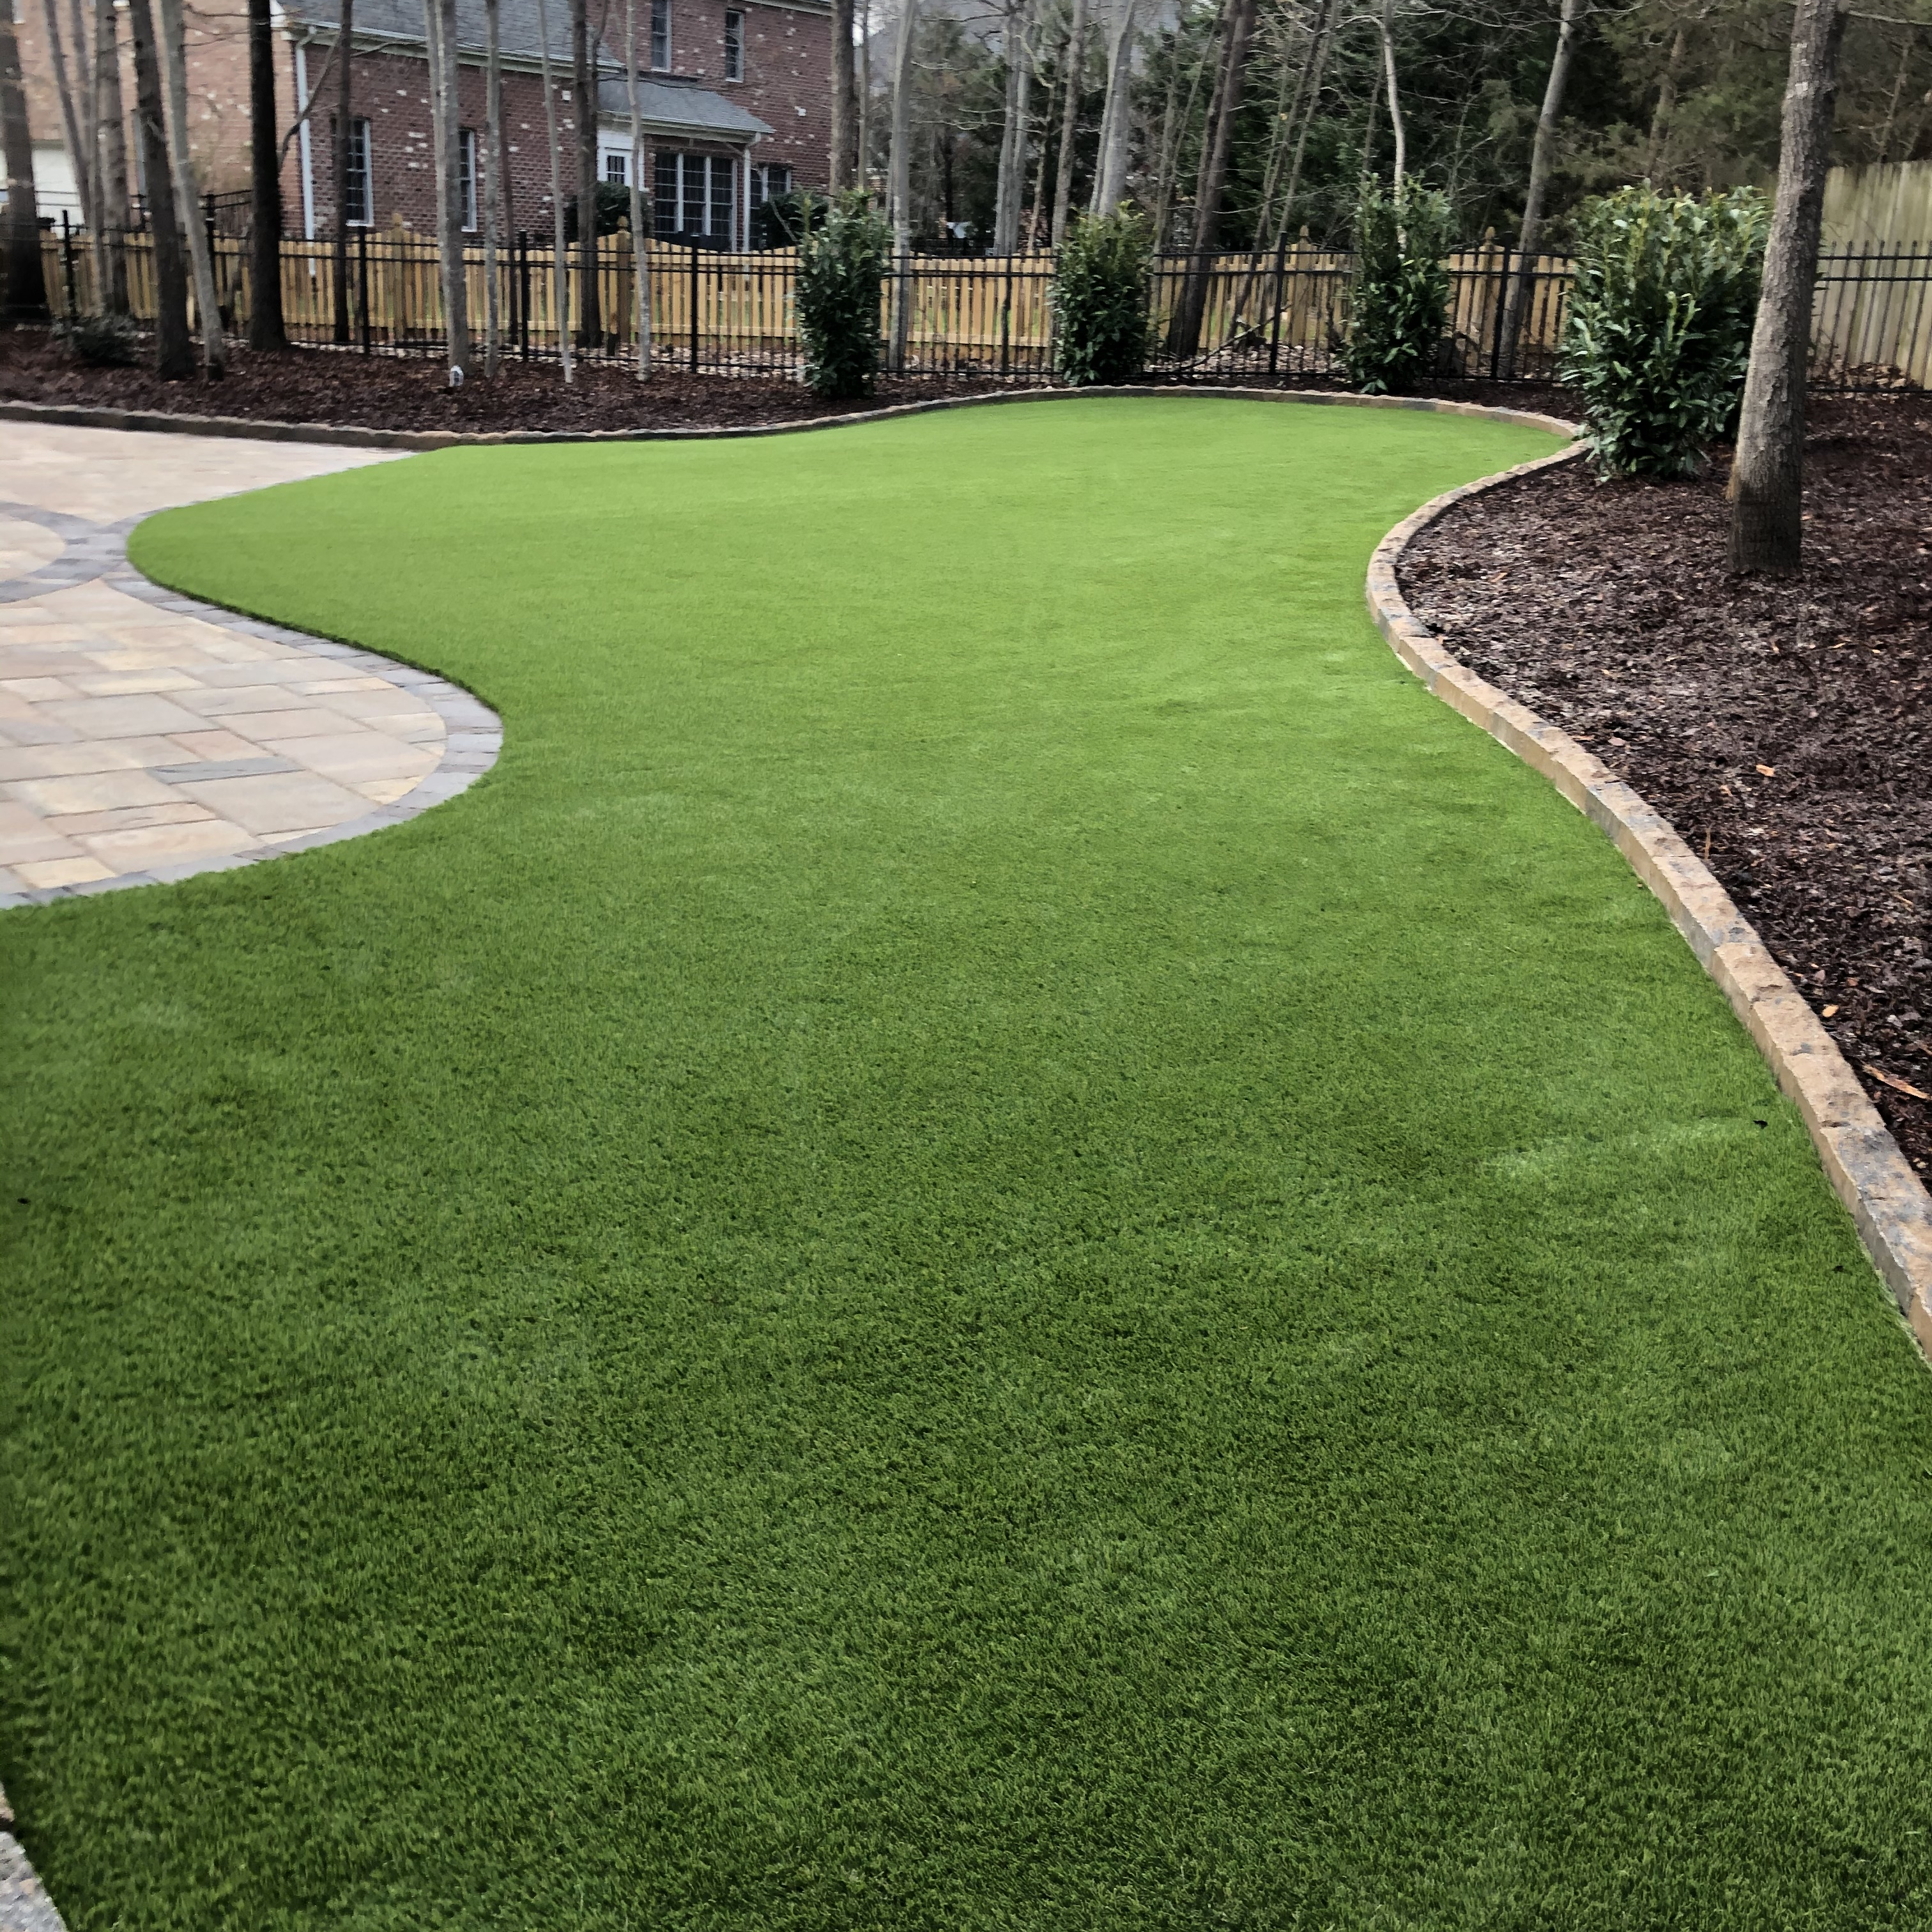 Spring-50 artificial grass for homes,artificial turf for homes,best artificial grass for home,astro turf for home,artificial lawns for homes